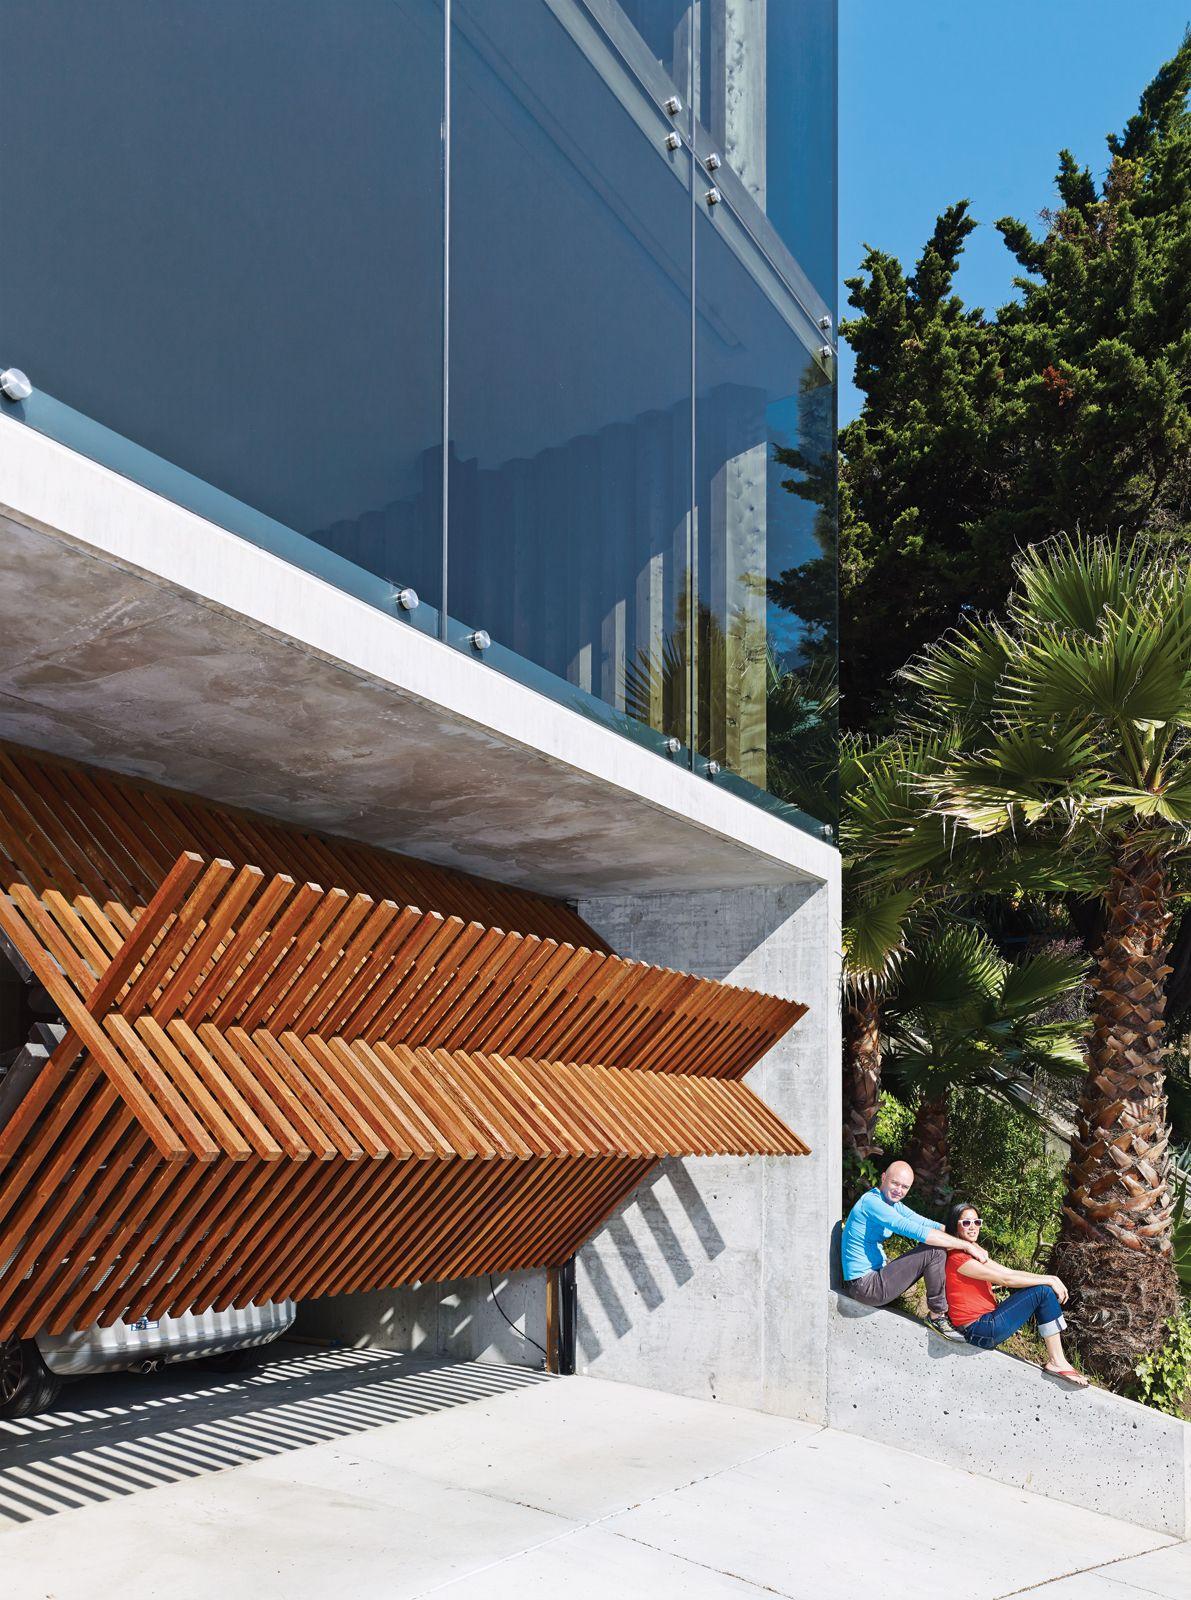 Cool residential garage doors - Garage Door Pivots Planks In Two Directions Peter S House Craig Steely